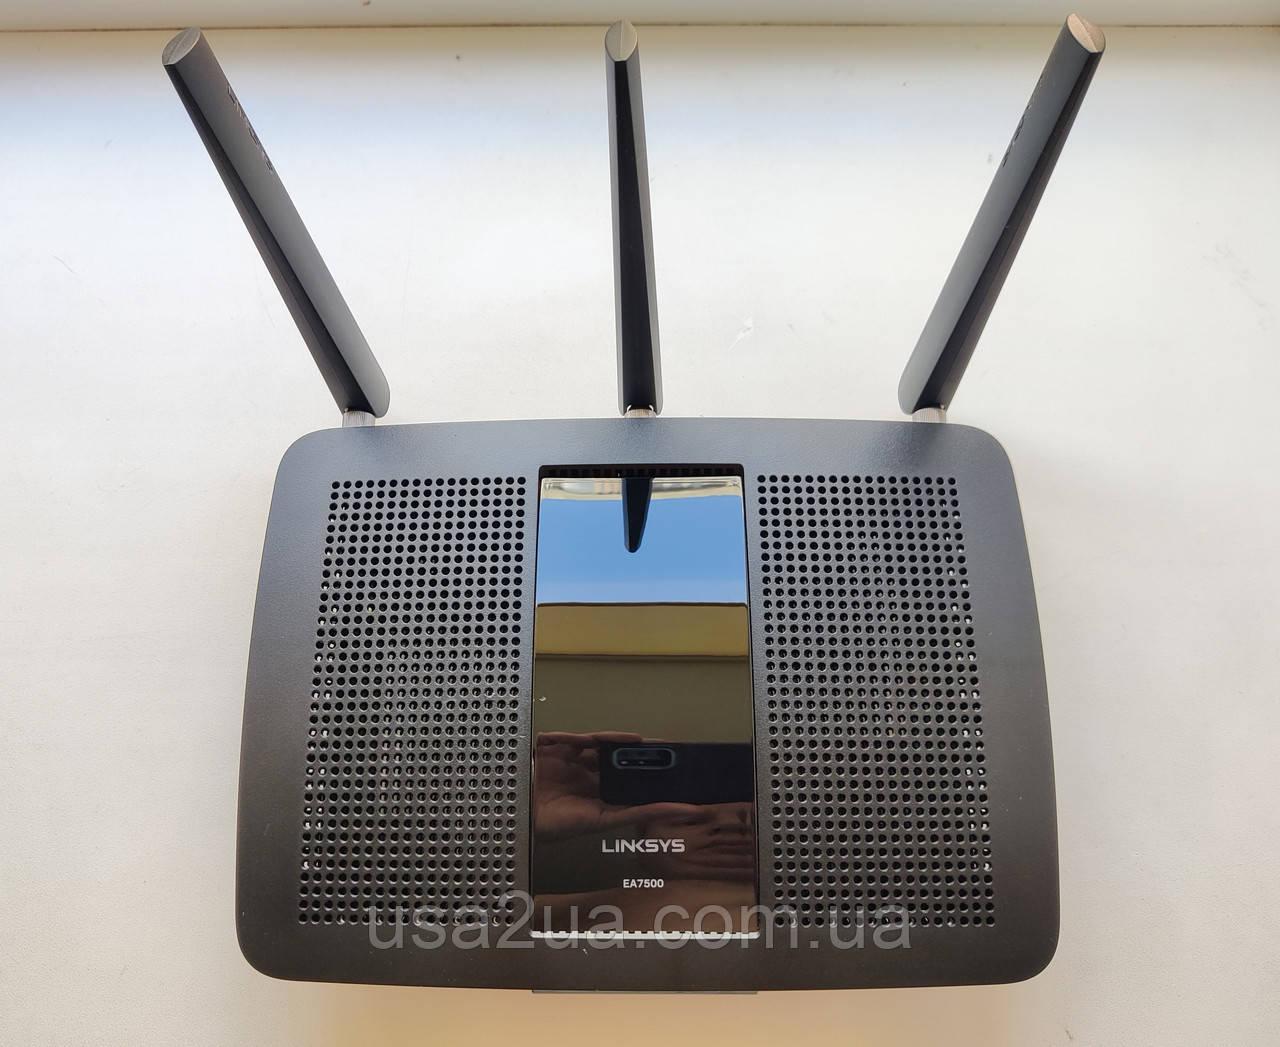 Cisco Linksys EA7500  AC1900 Gigabit Wi-Fi Router  2.4  5 ГГц роутер маршрутизатор Гарантия Кредит